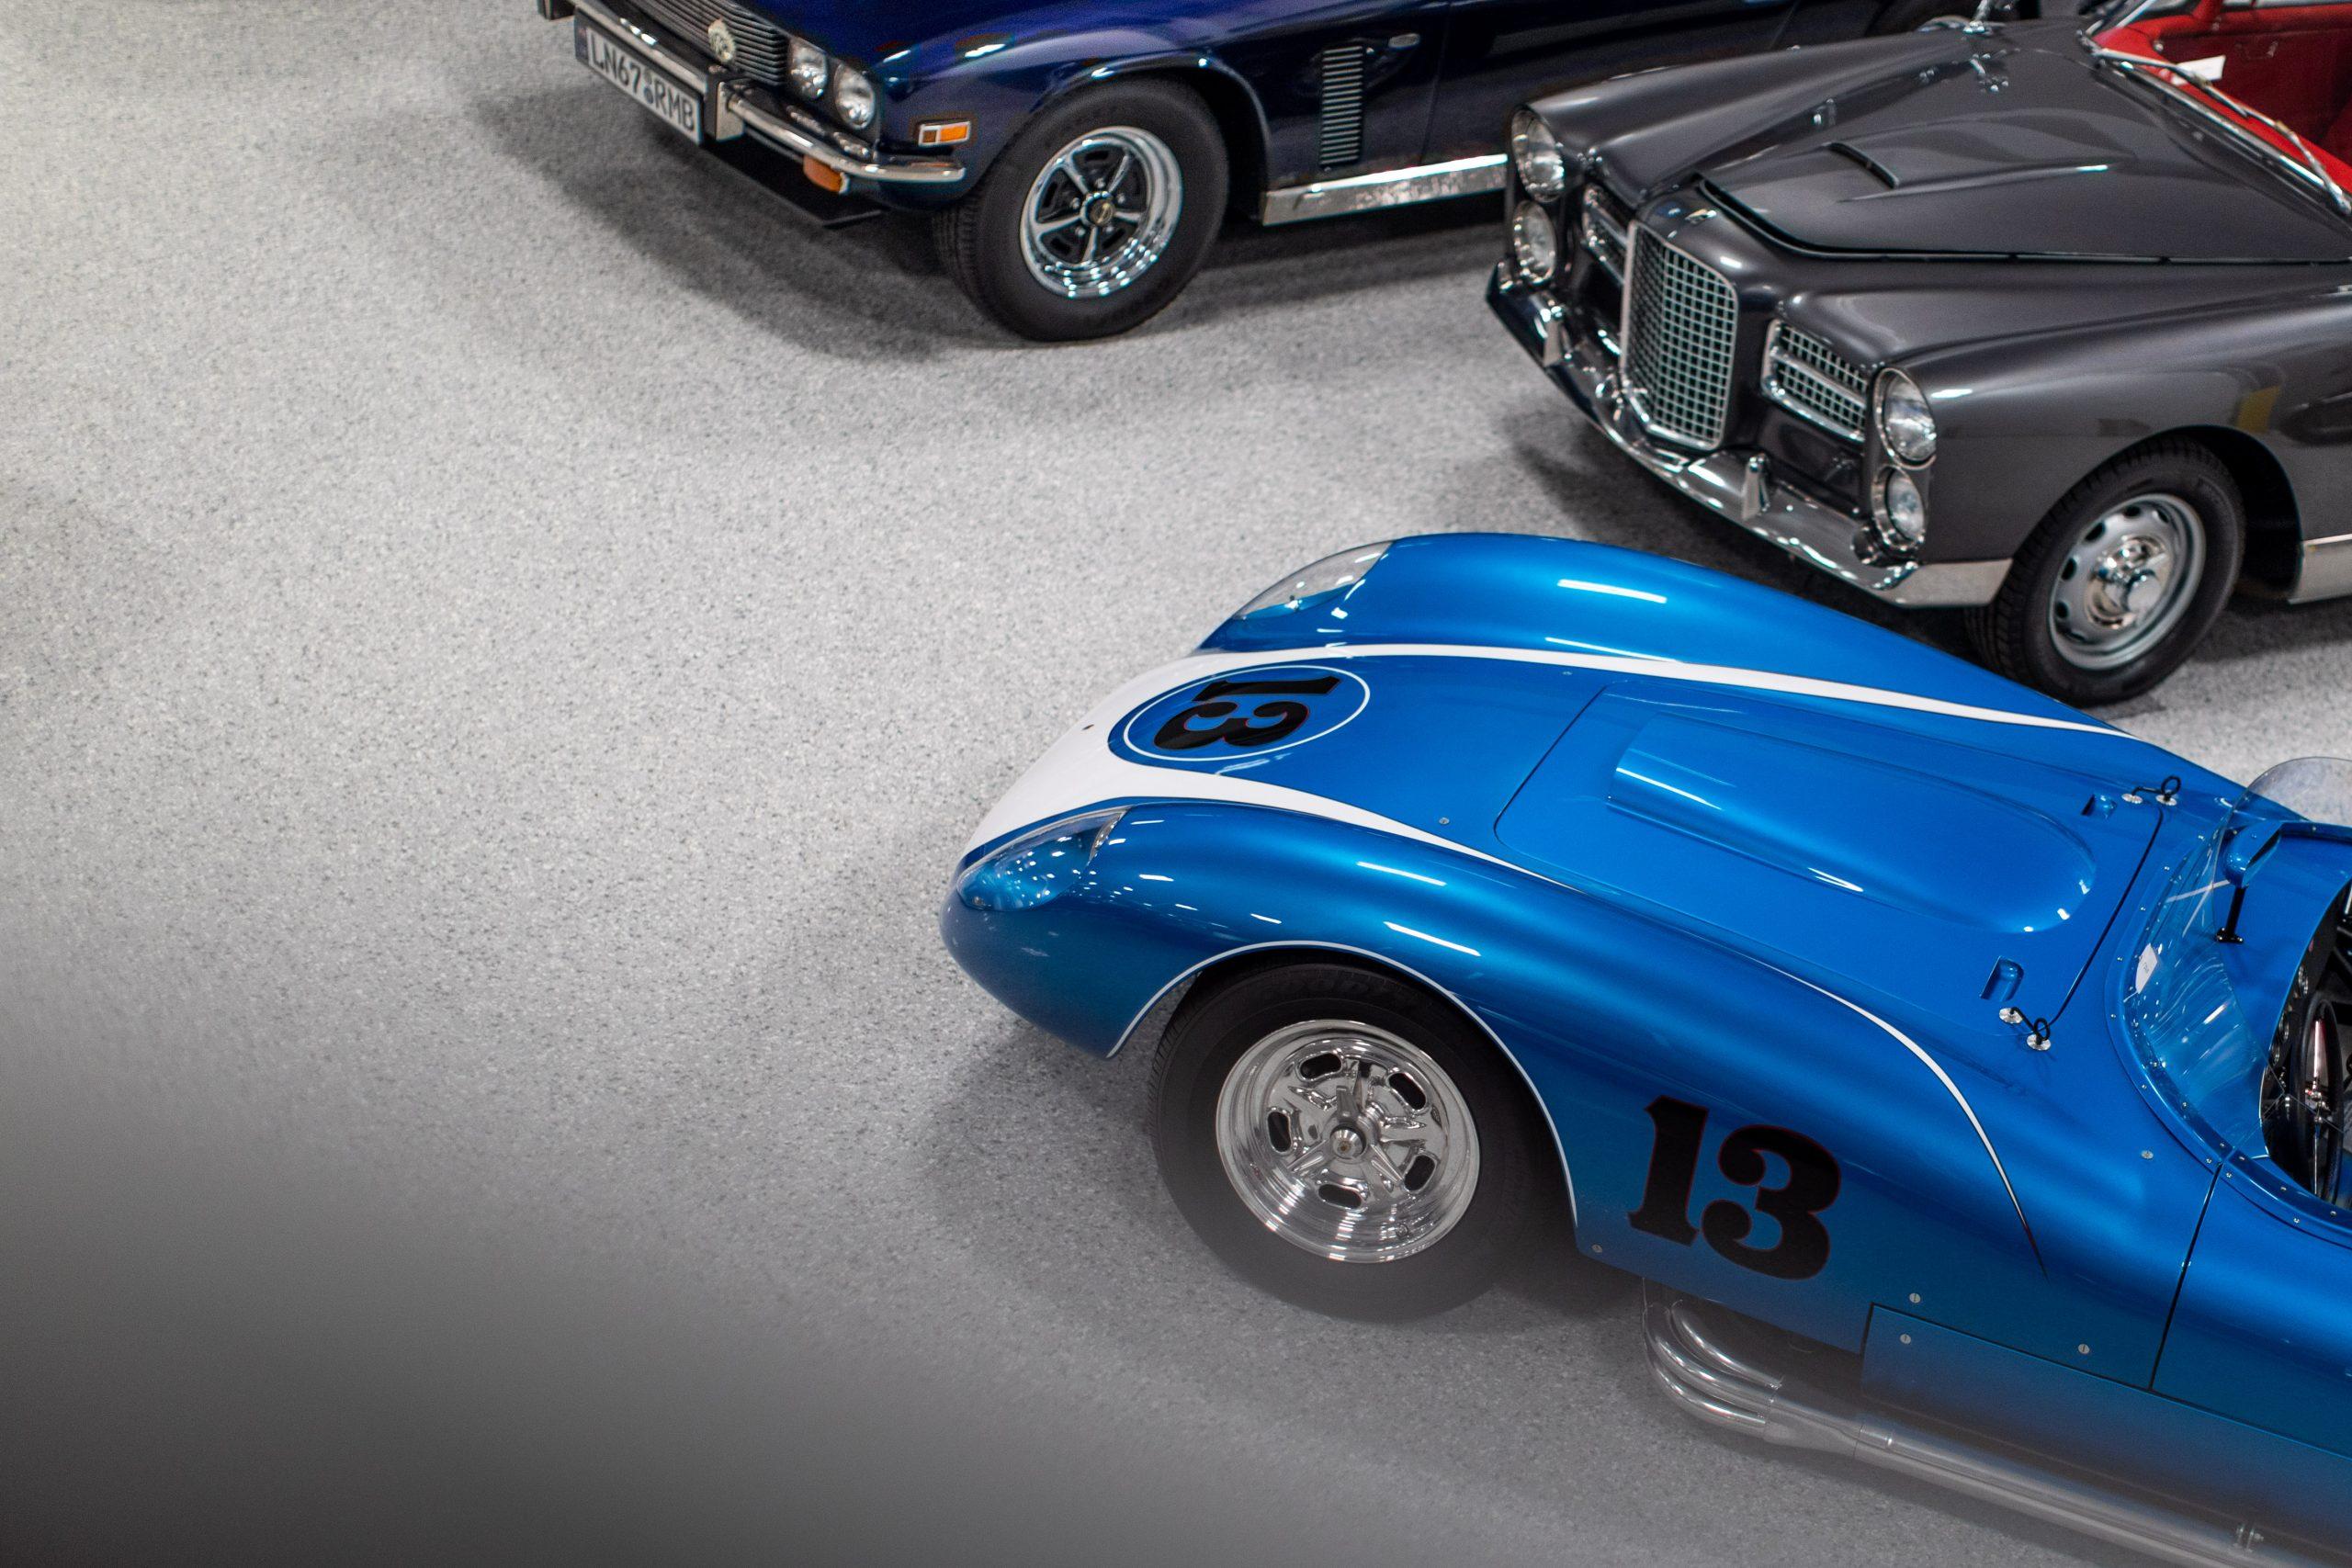 1958 Scarab Reproduction Car Overhead